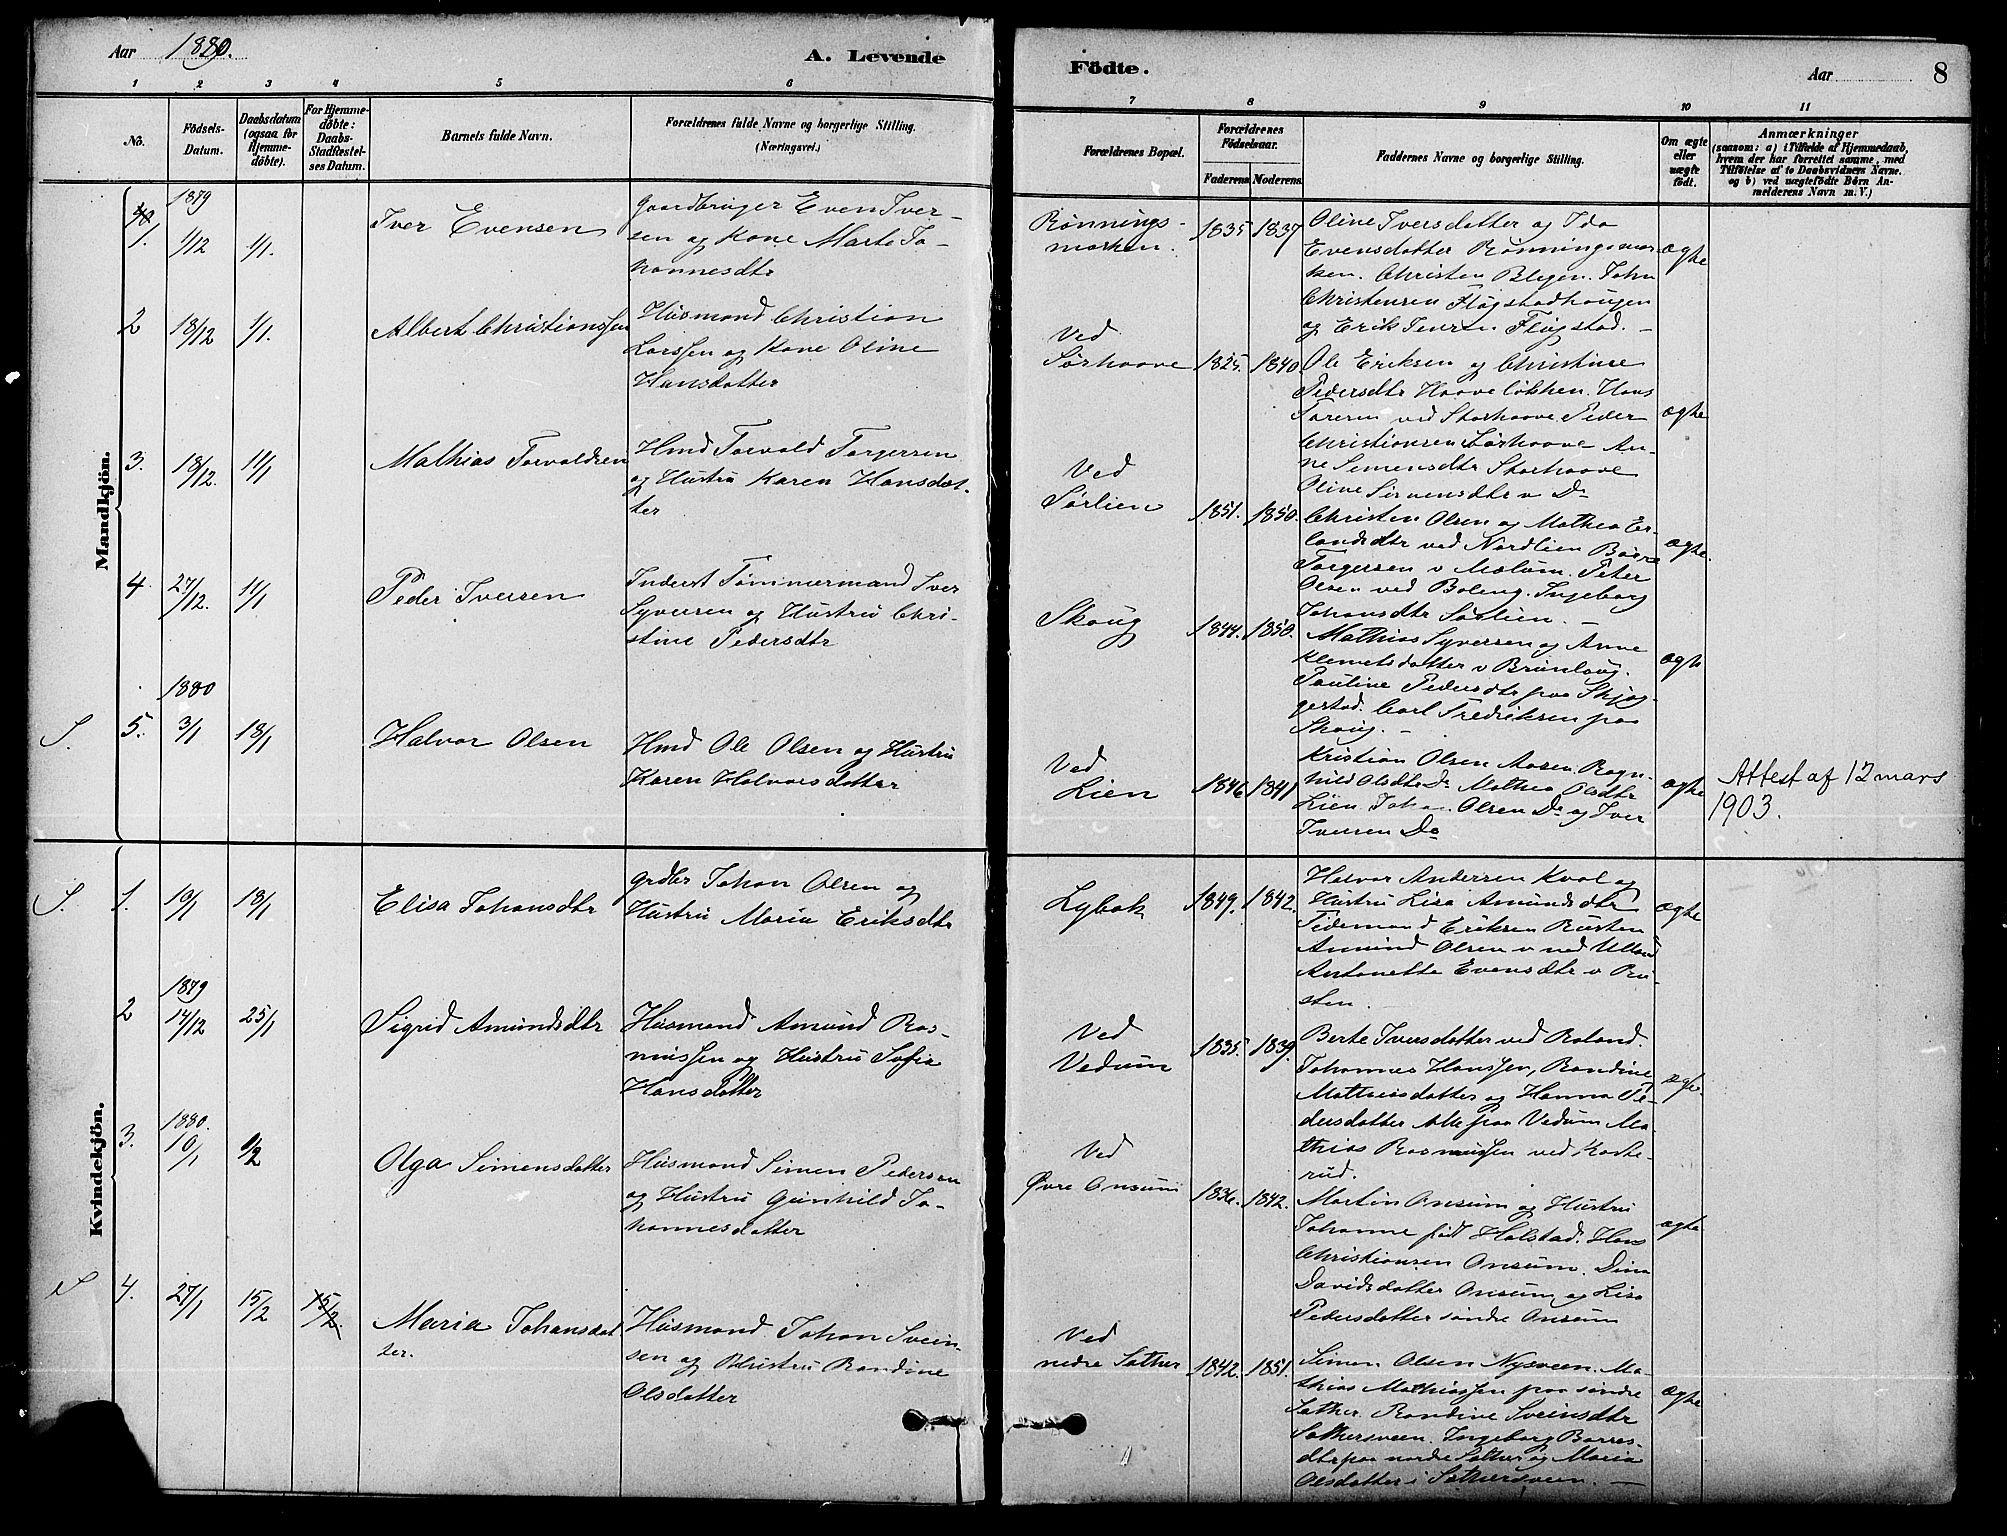 SAH, Fåberg prestekontor, Ministerialbok nr. 8, 1879-1898, s. 8